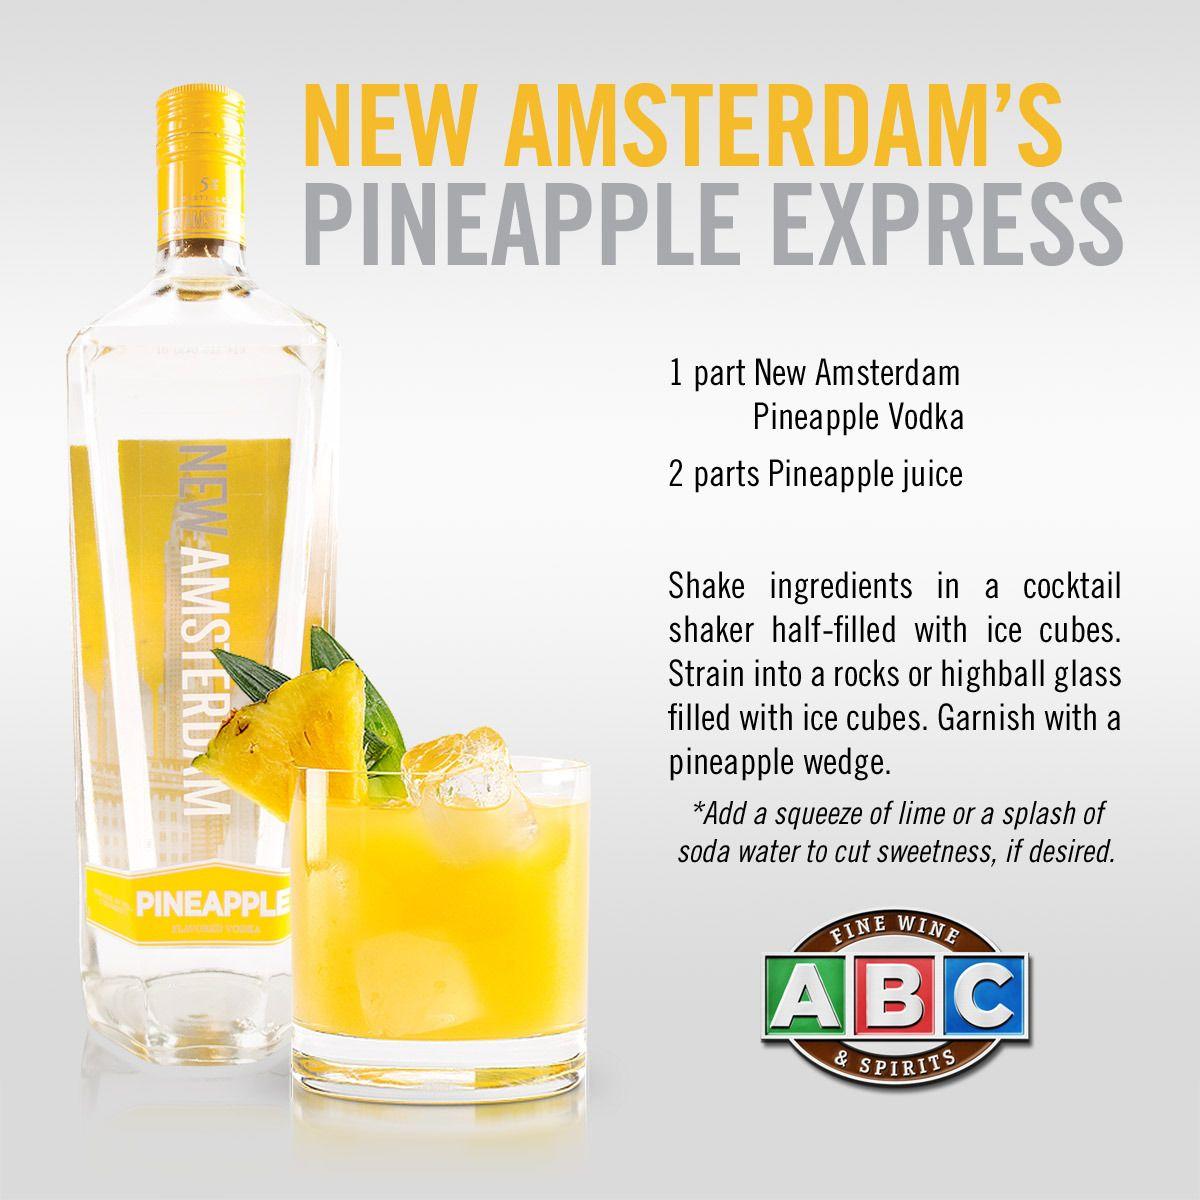 New Amsterdam Pineapple Express Pineapple Vodka Liquor Recipes